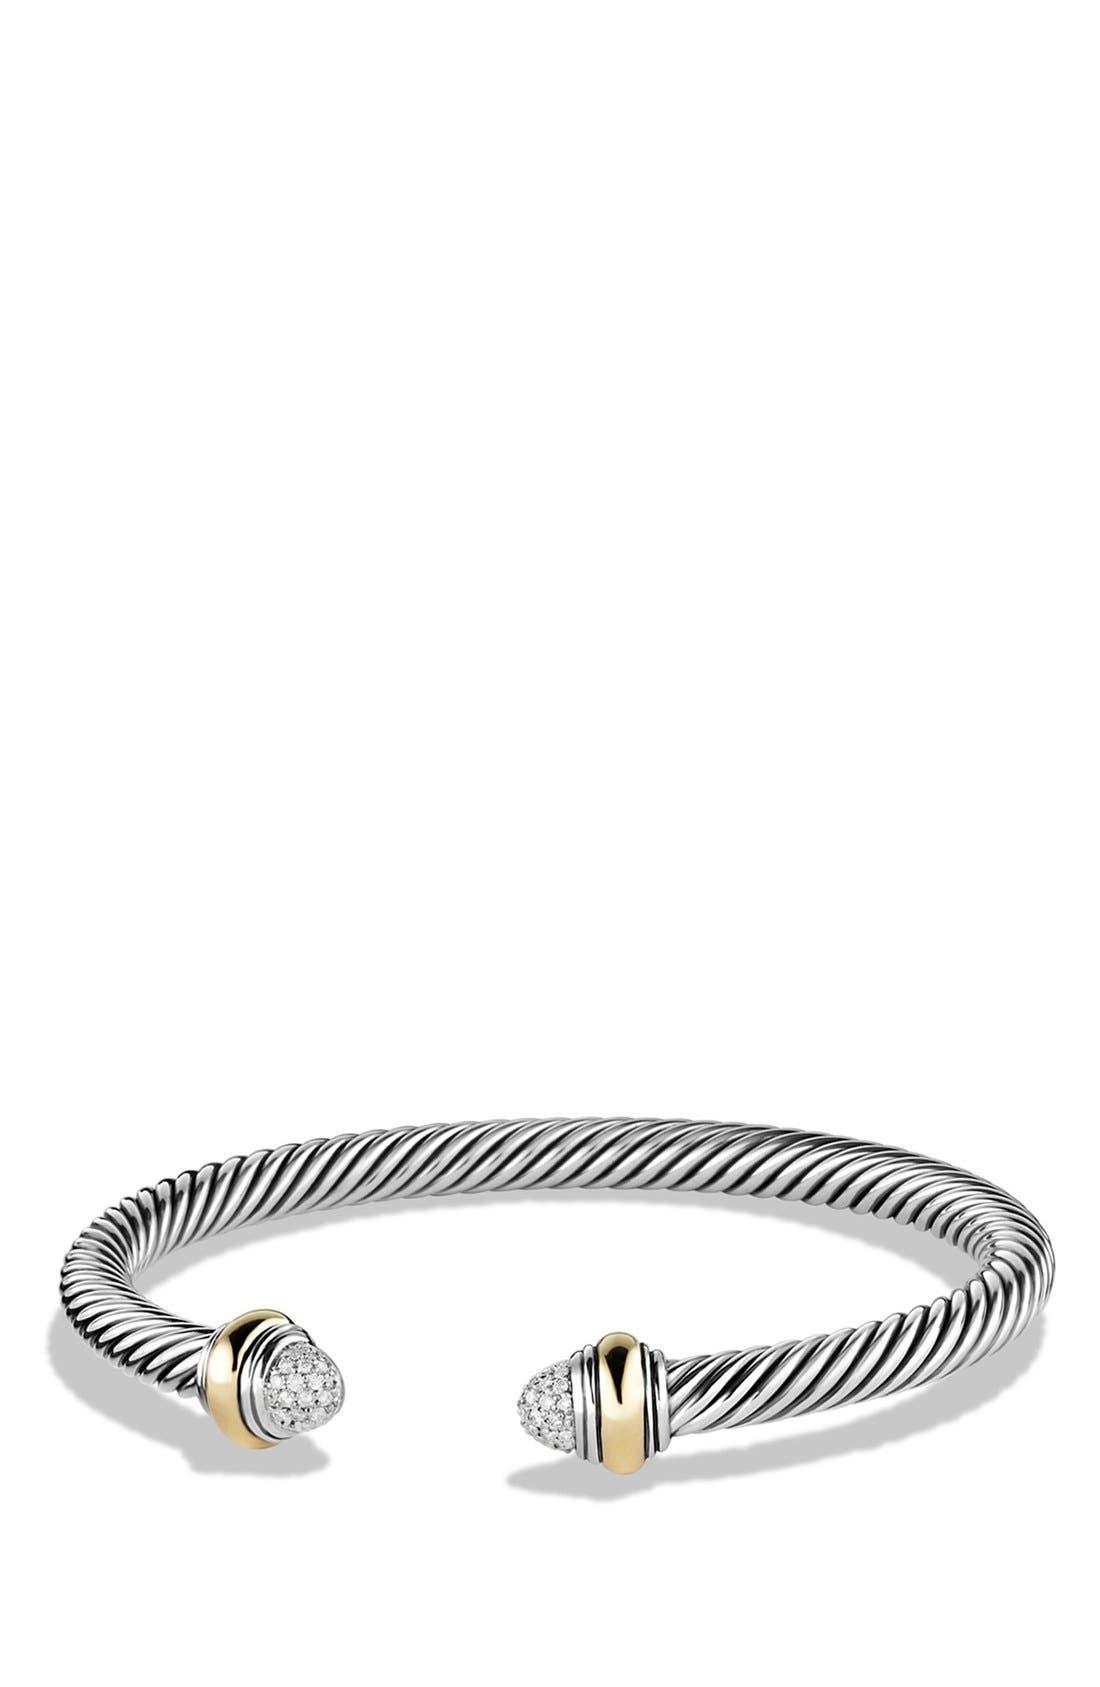 Cable Classics Bracelet with Diamonds & 14K Gold, 5mm,                             Main thumbnail 1, color,                             DIAMOND